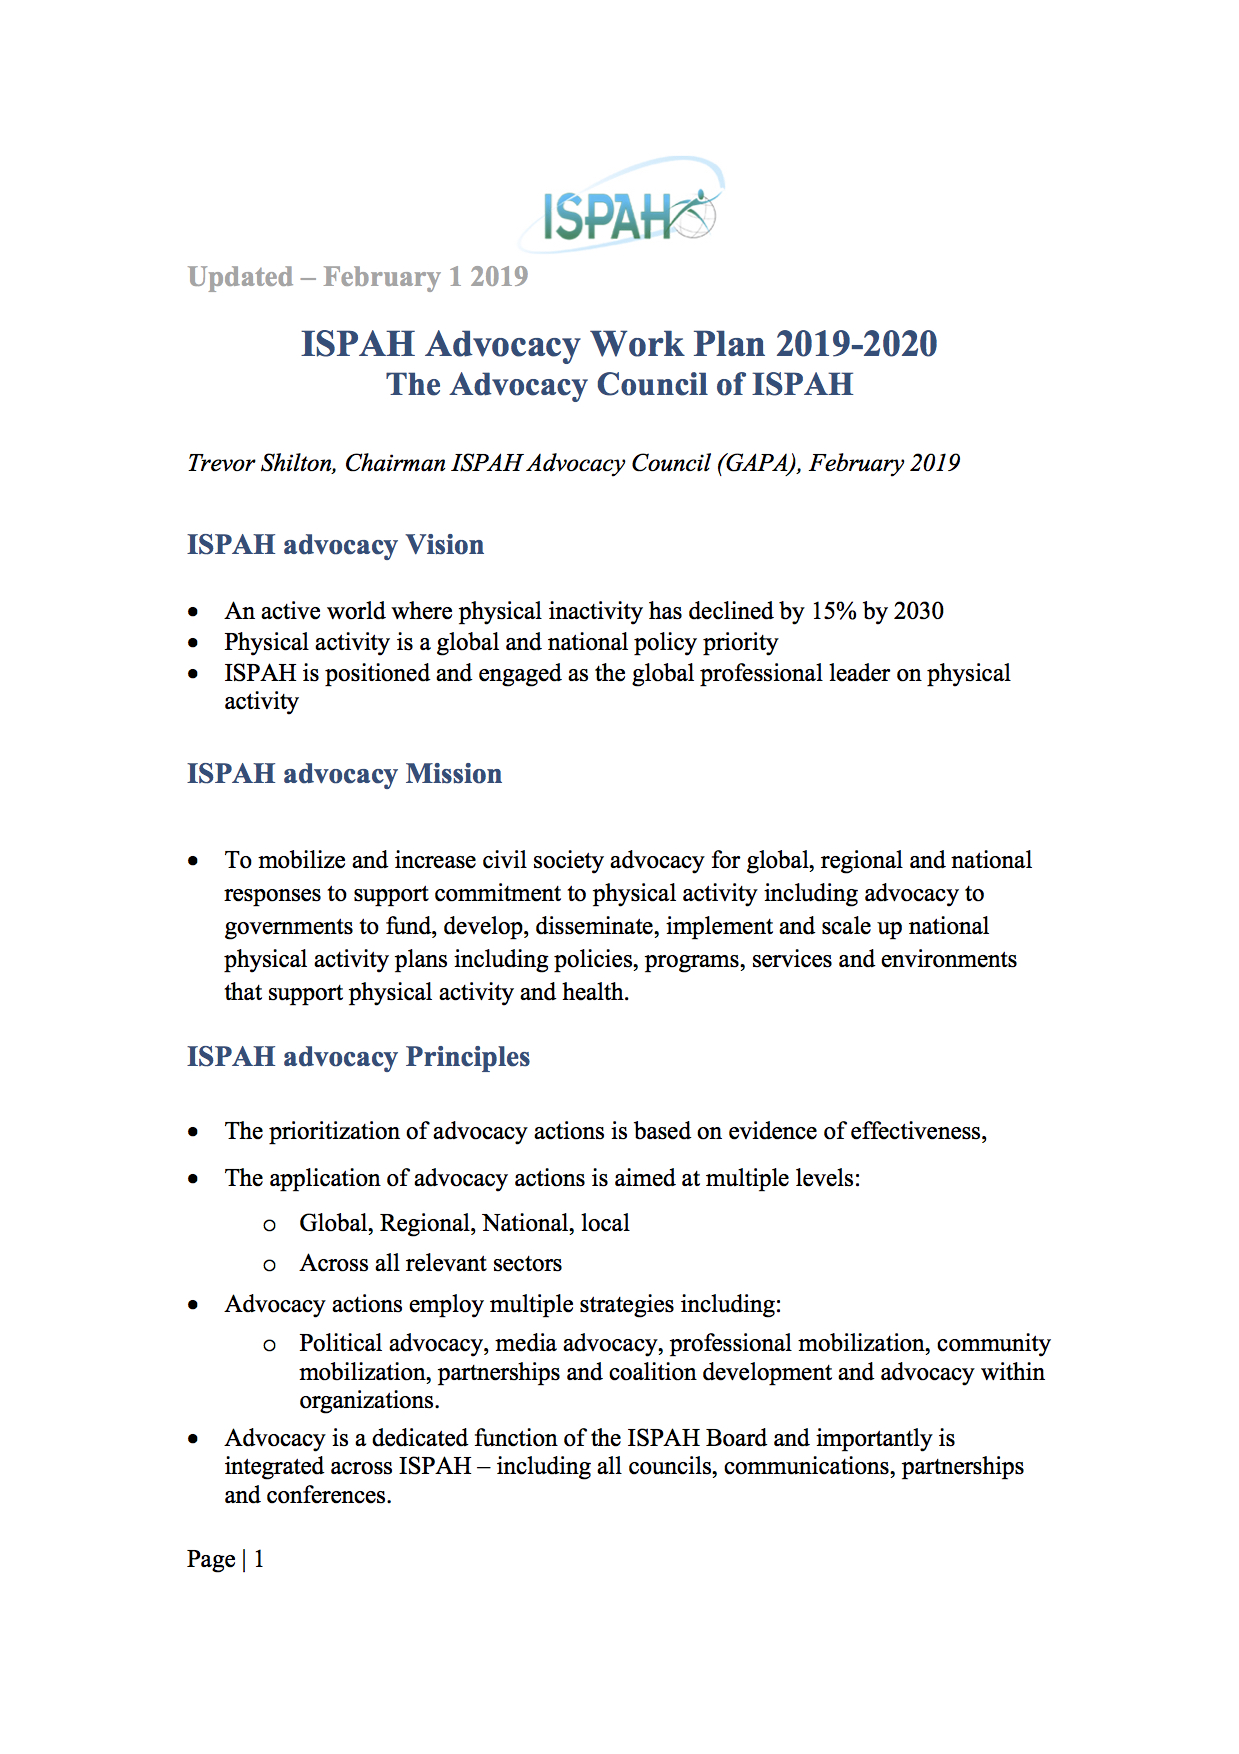 GAPA 2019-2020- Plan_Updated February 2019_1 copy.jpg